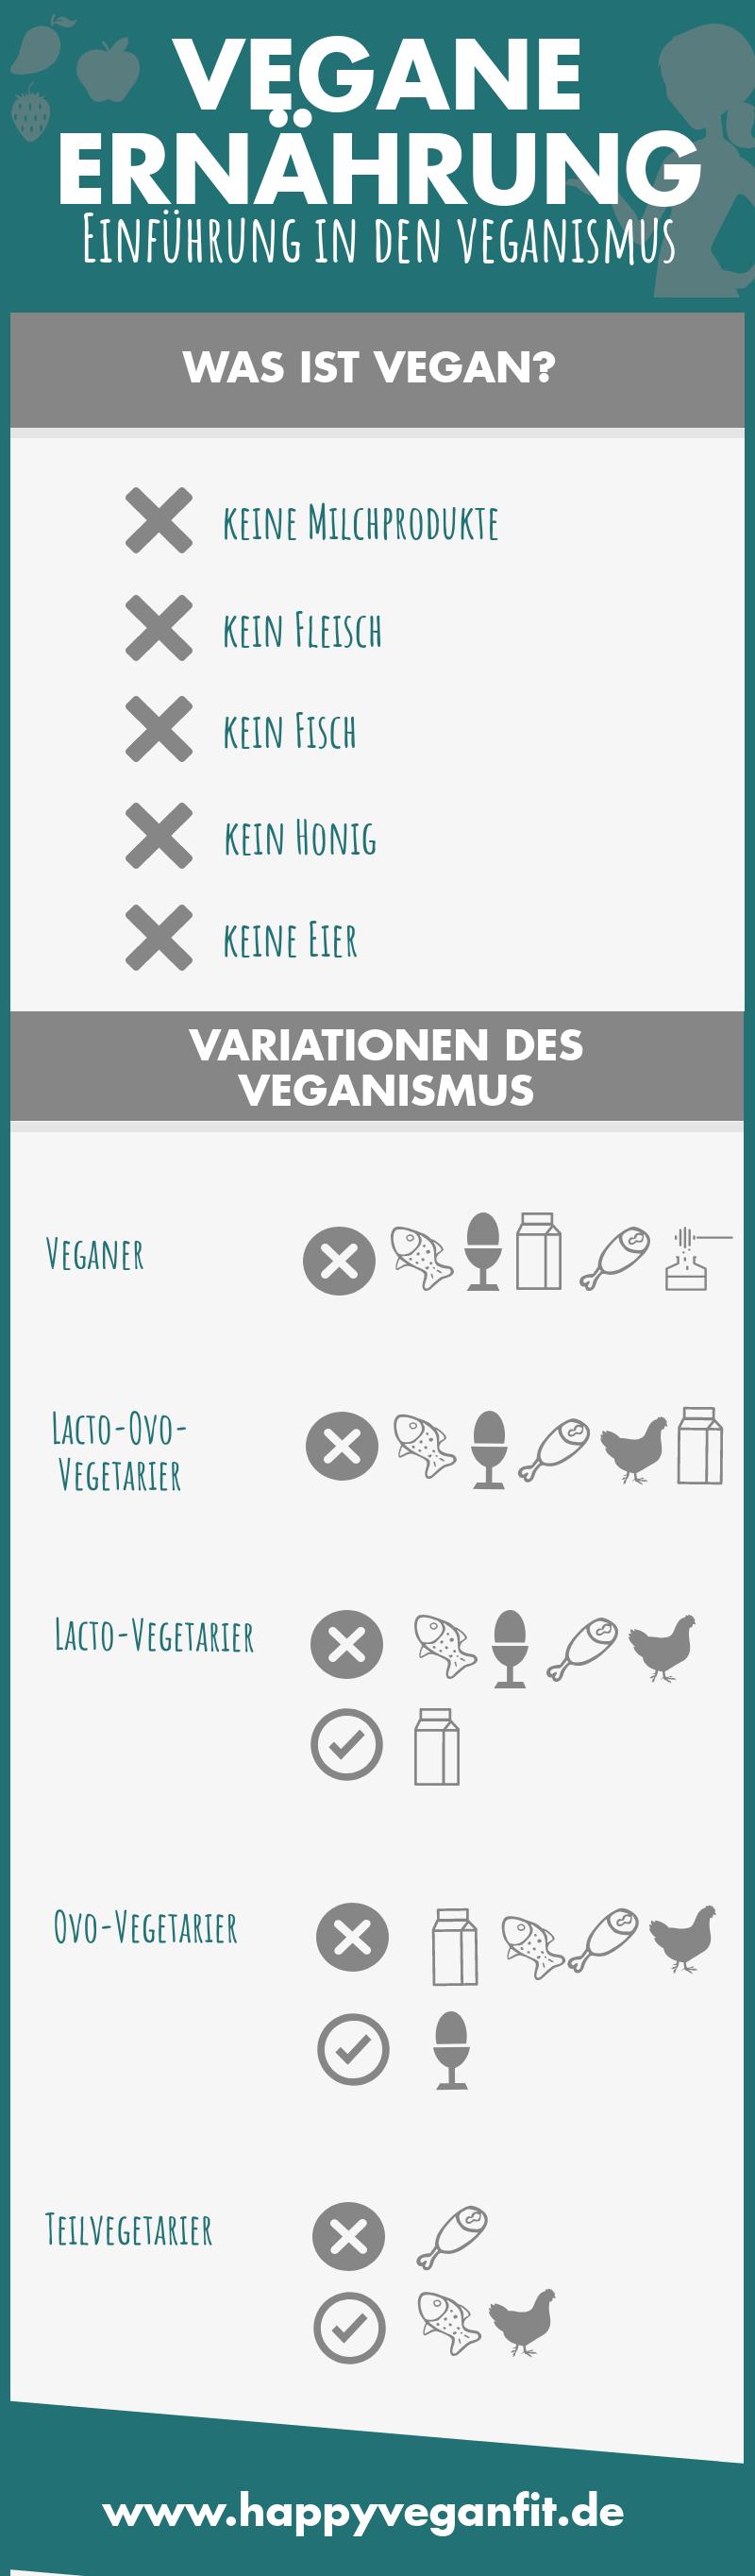 vegan abnehmen infografik